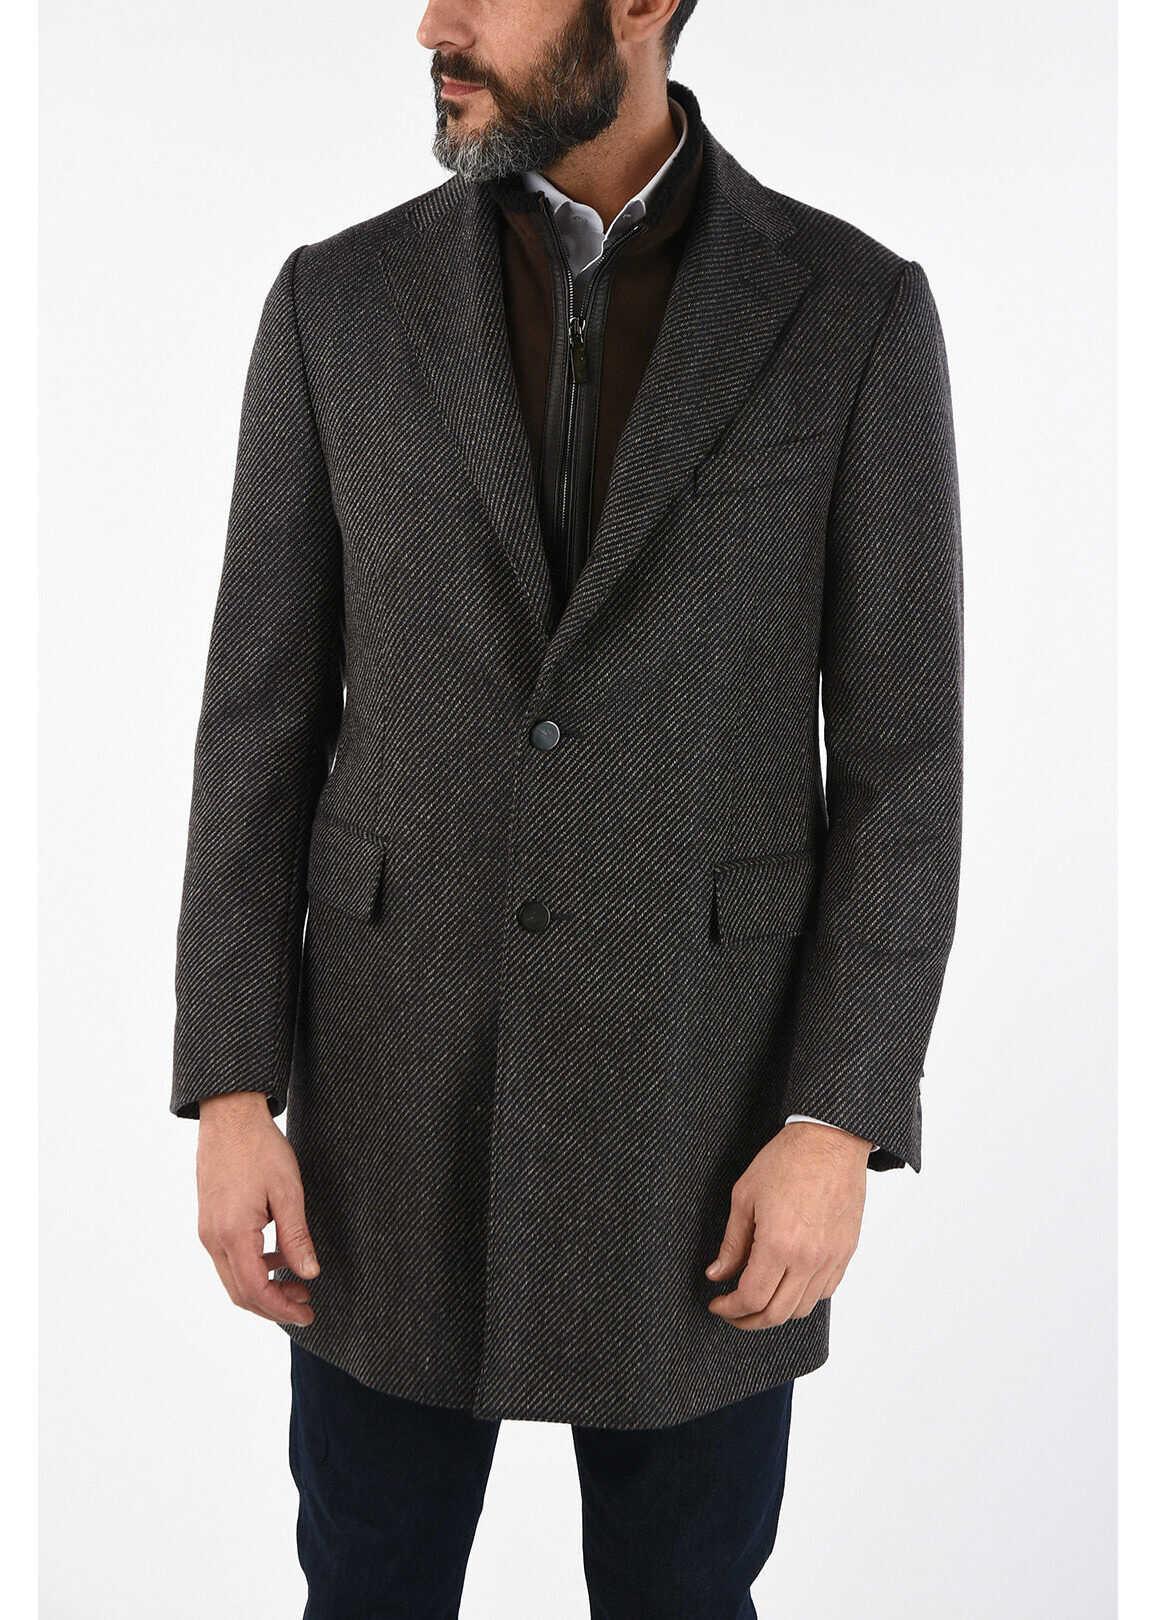 CORNELIANI ID plain herringbone cashmere IDENTITY coat MULTICOLOR imagine